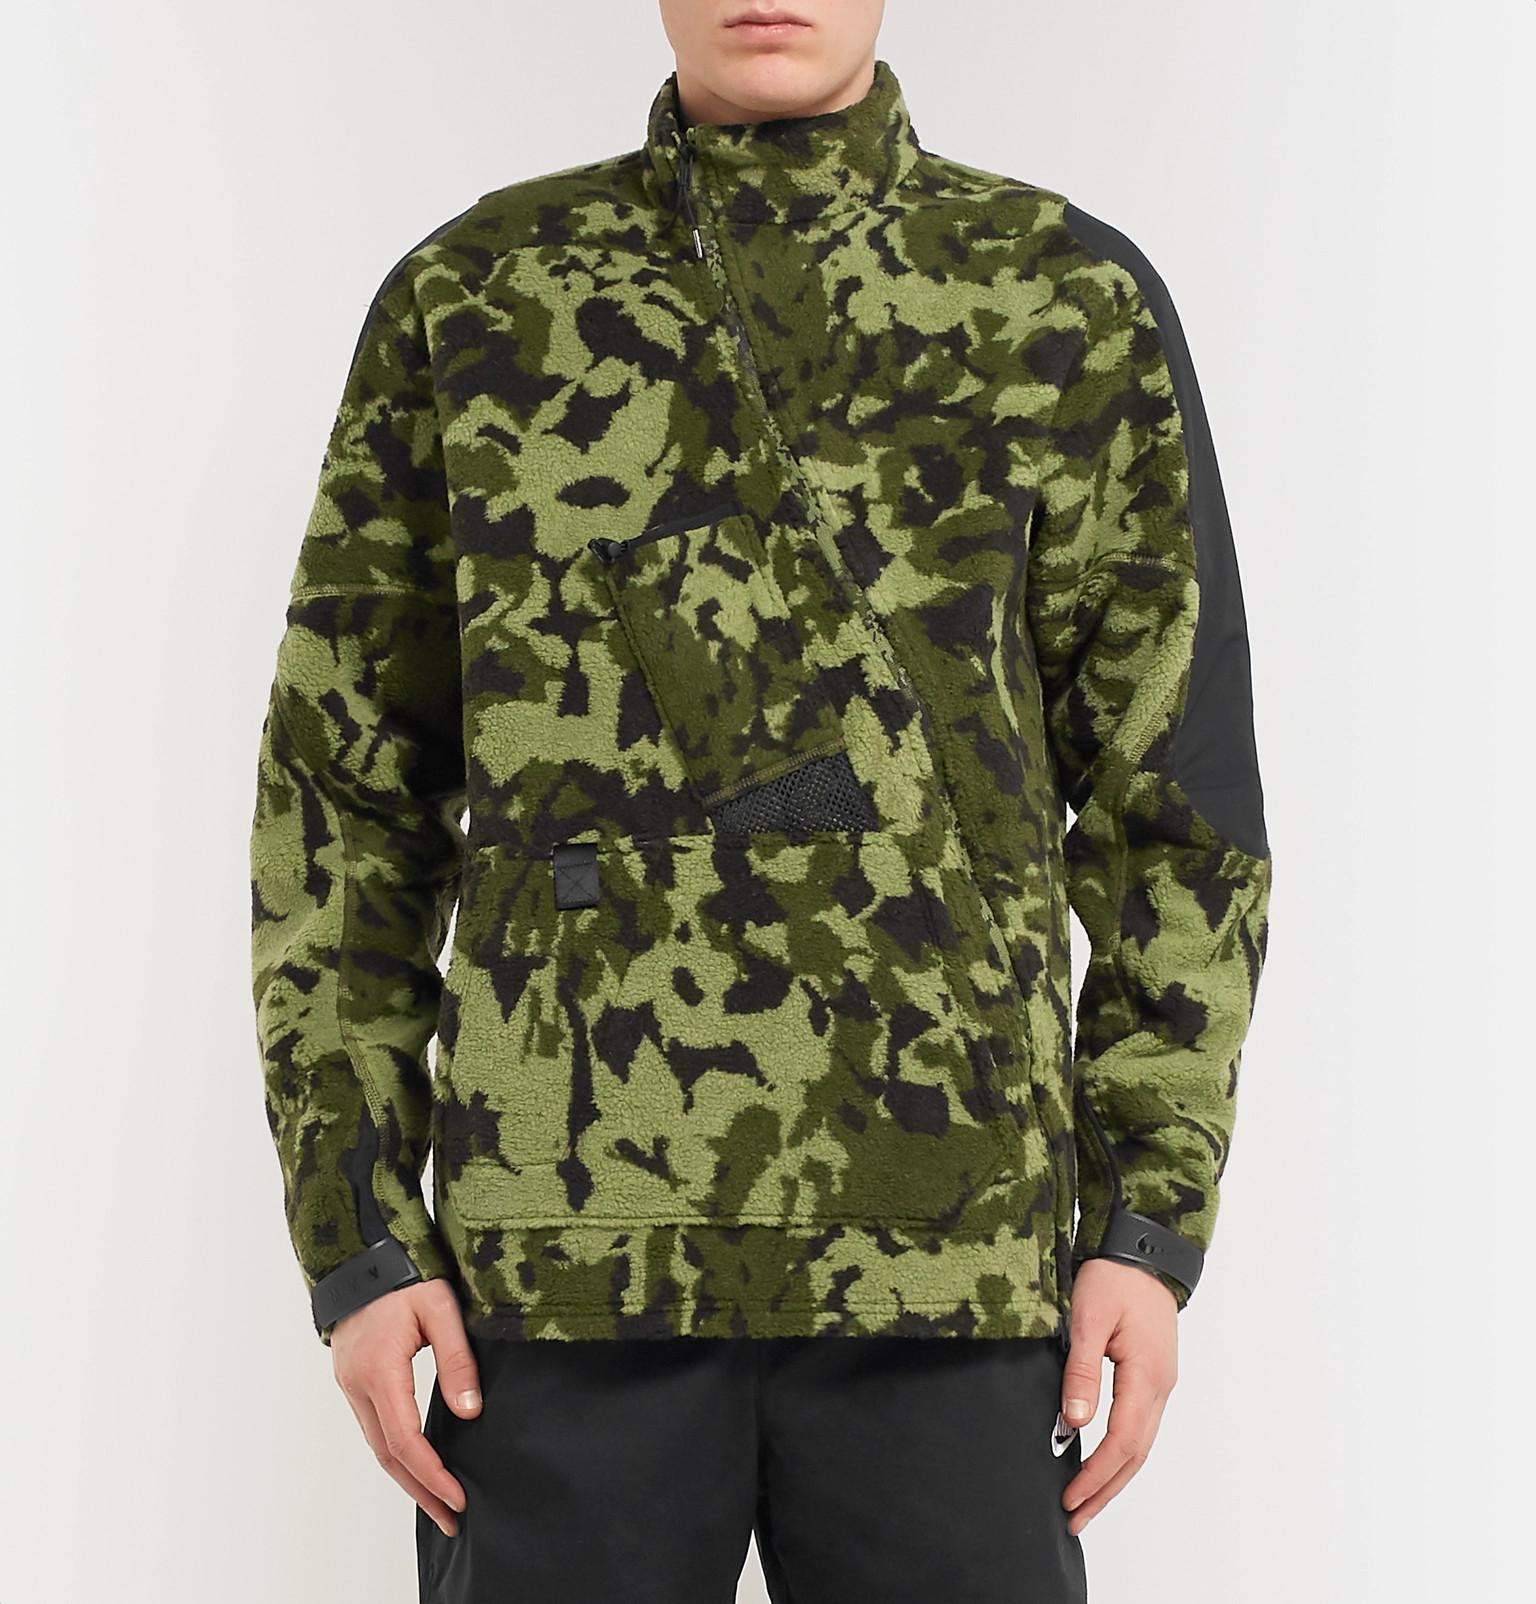 b292828d62e0 Nike X Alyx Mmw Two-part Camouflage Hooded Fleece Jacket in Green ...